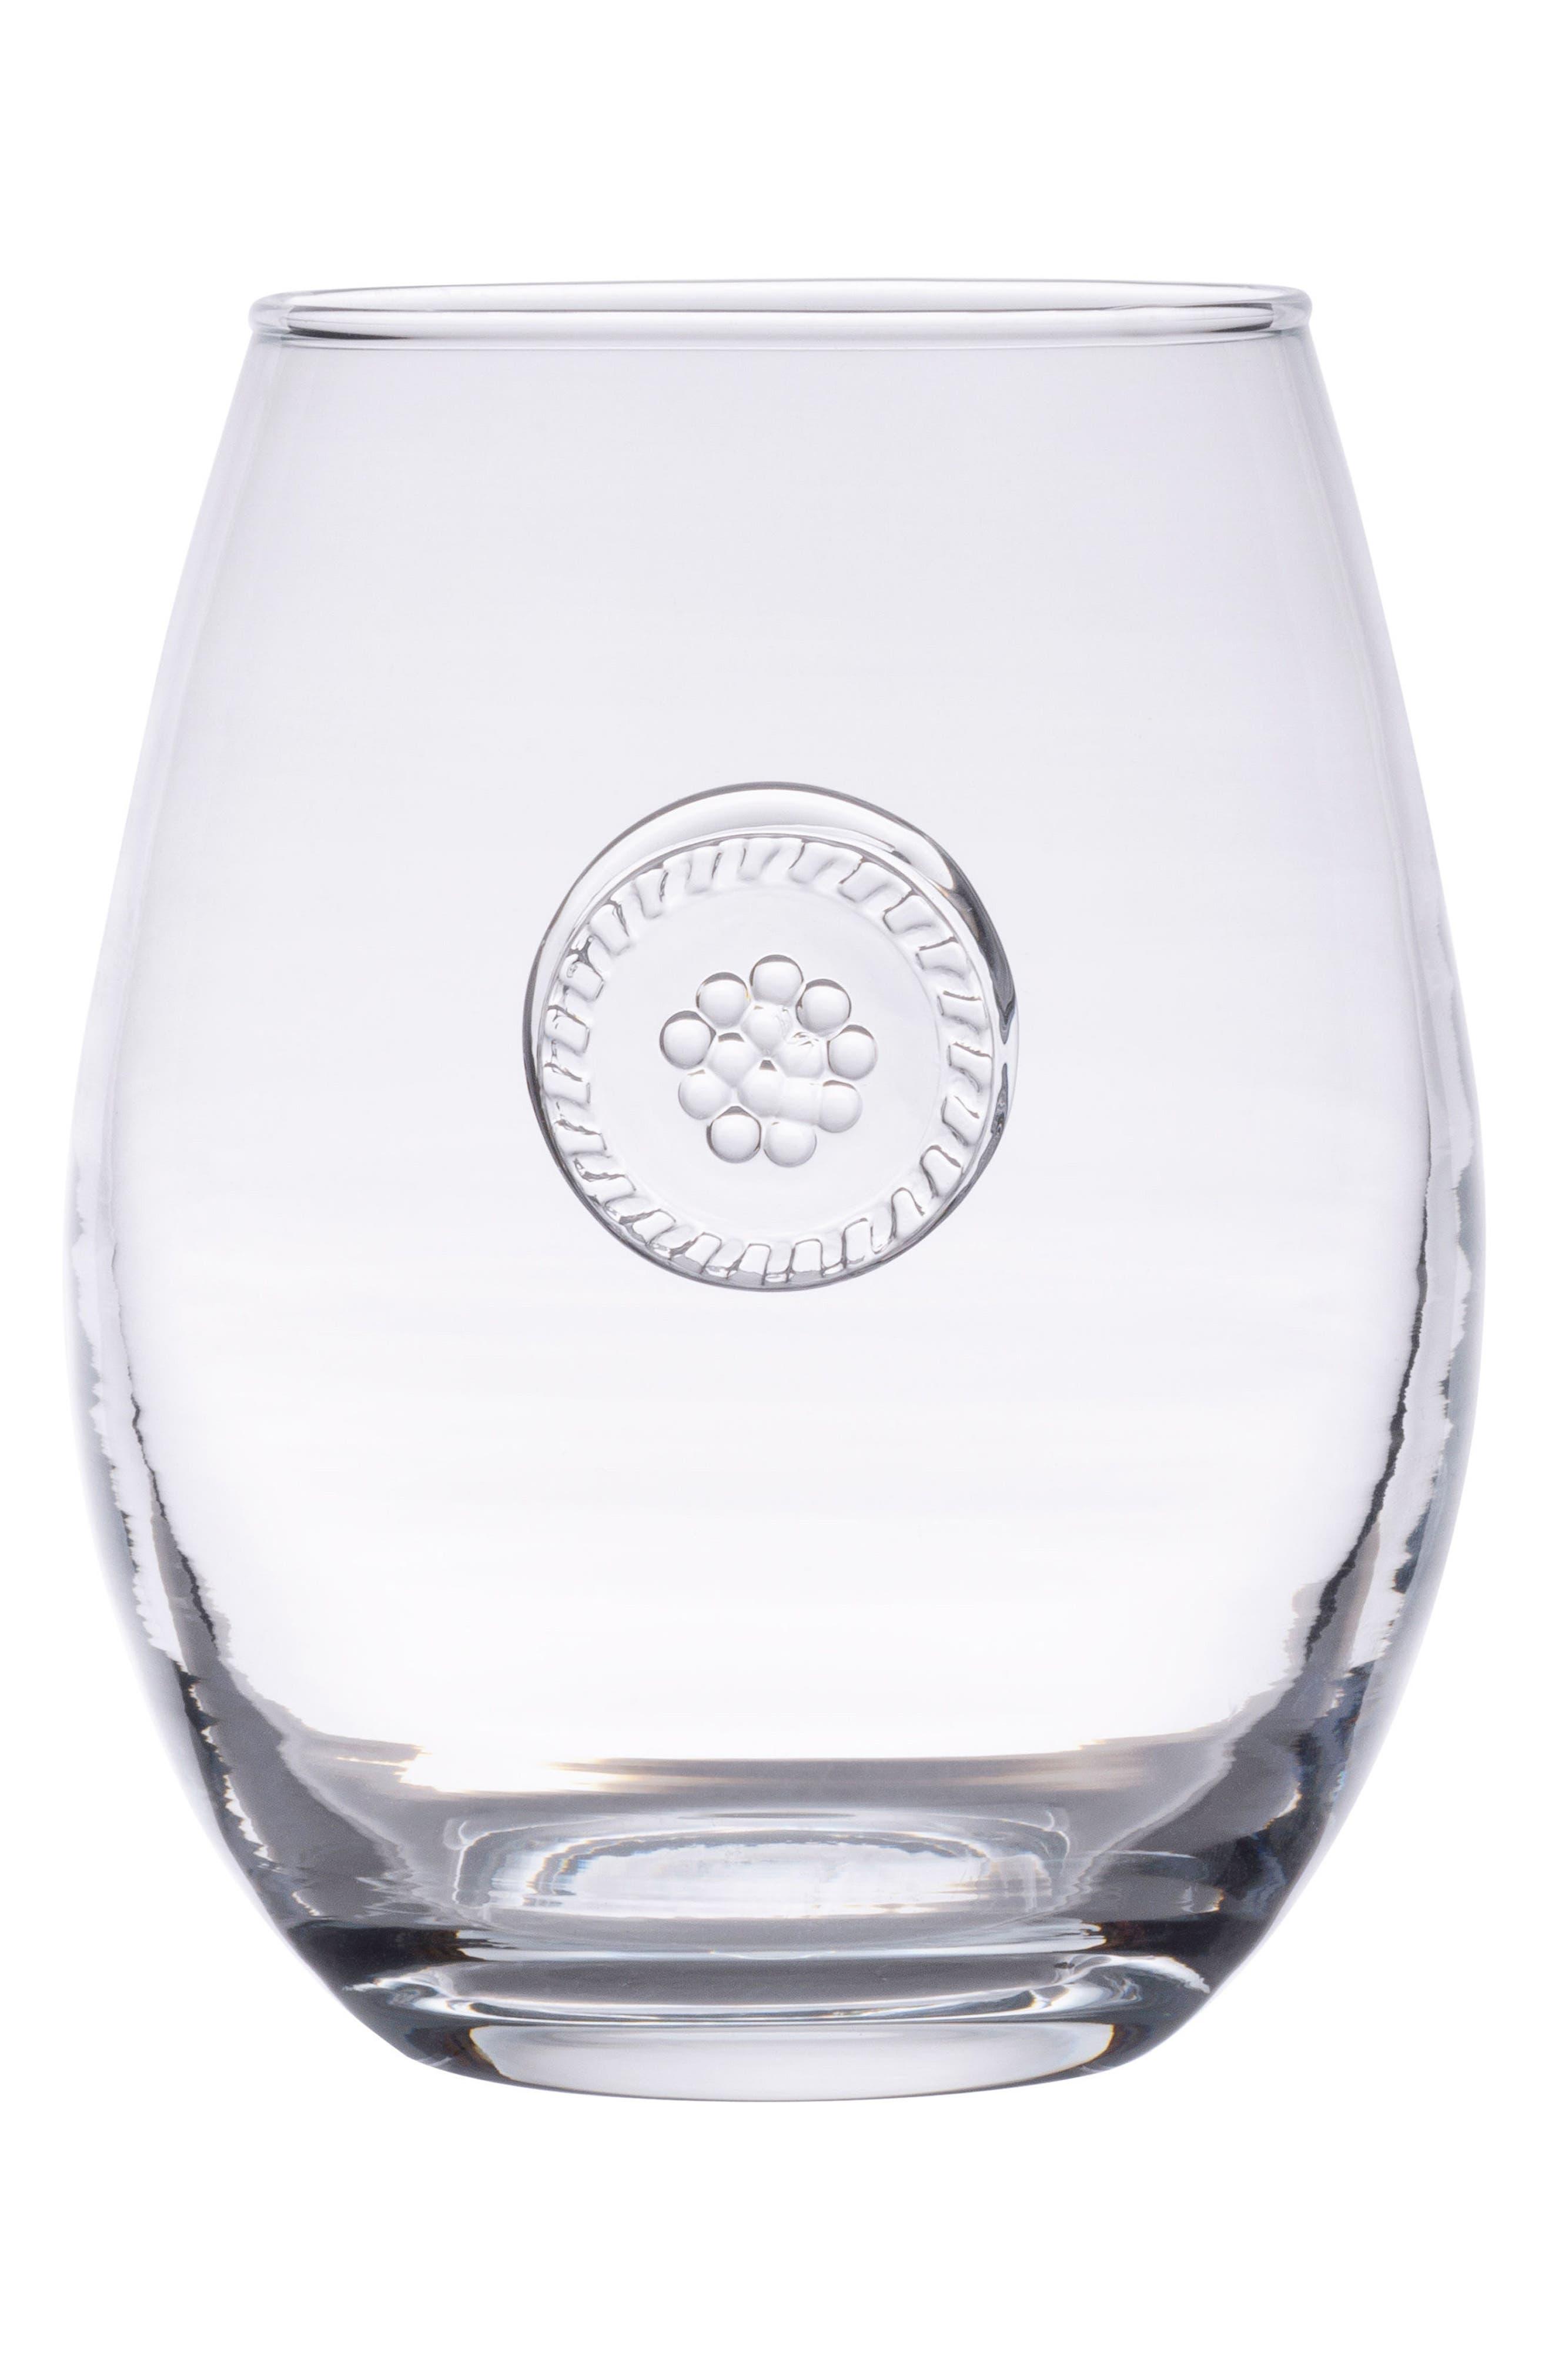 Juliska Berry & Thread Stemless White Wine Glass